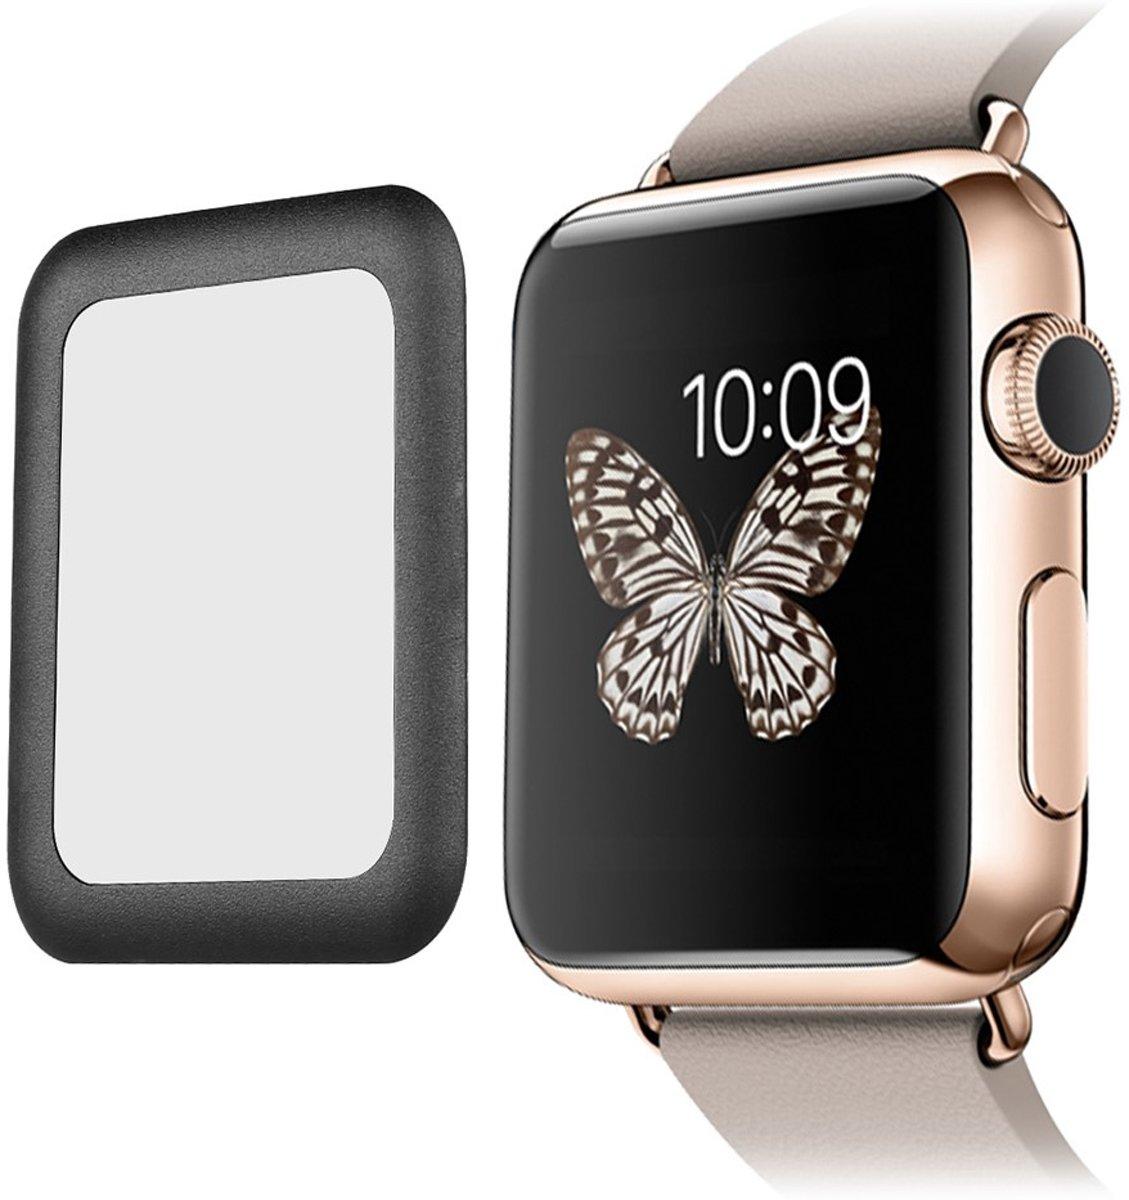 Tempered Glass Screenprotector 0.2mm  voor Apple Watch Series 1 / Series 2 / Series 3 (42mm)  Full Coverage - Zwart kopen